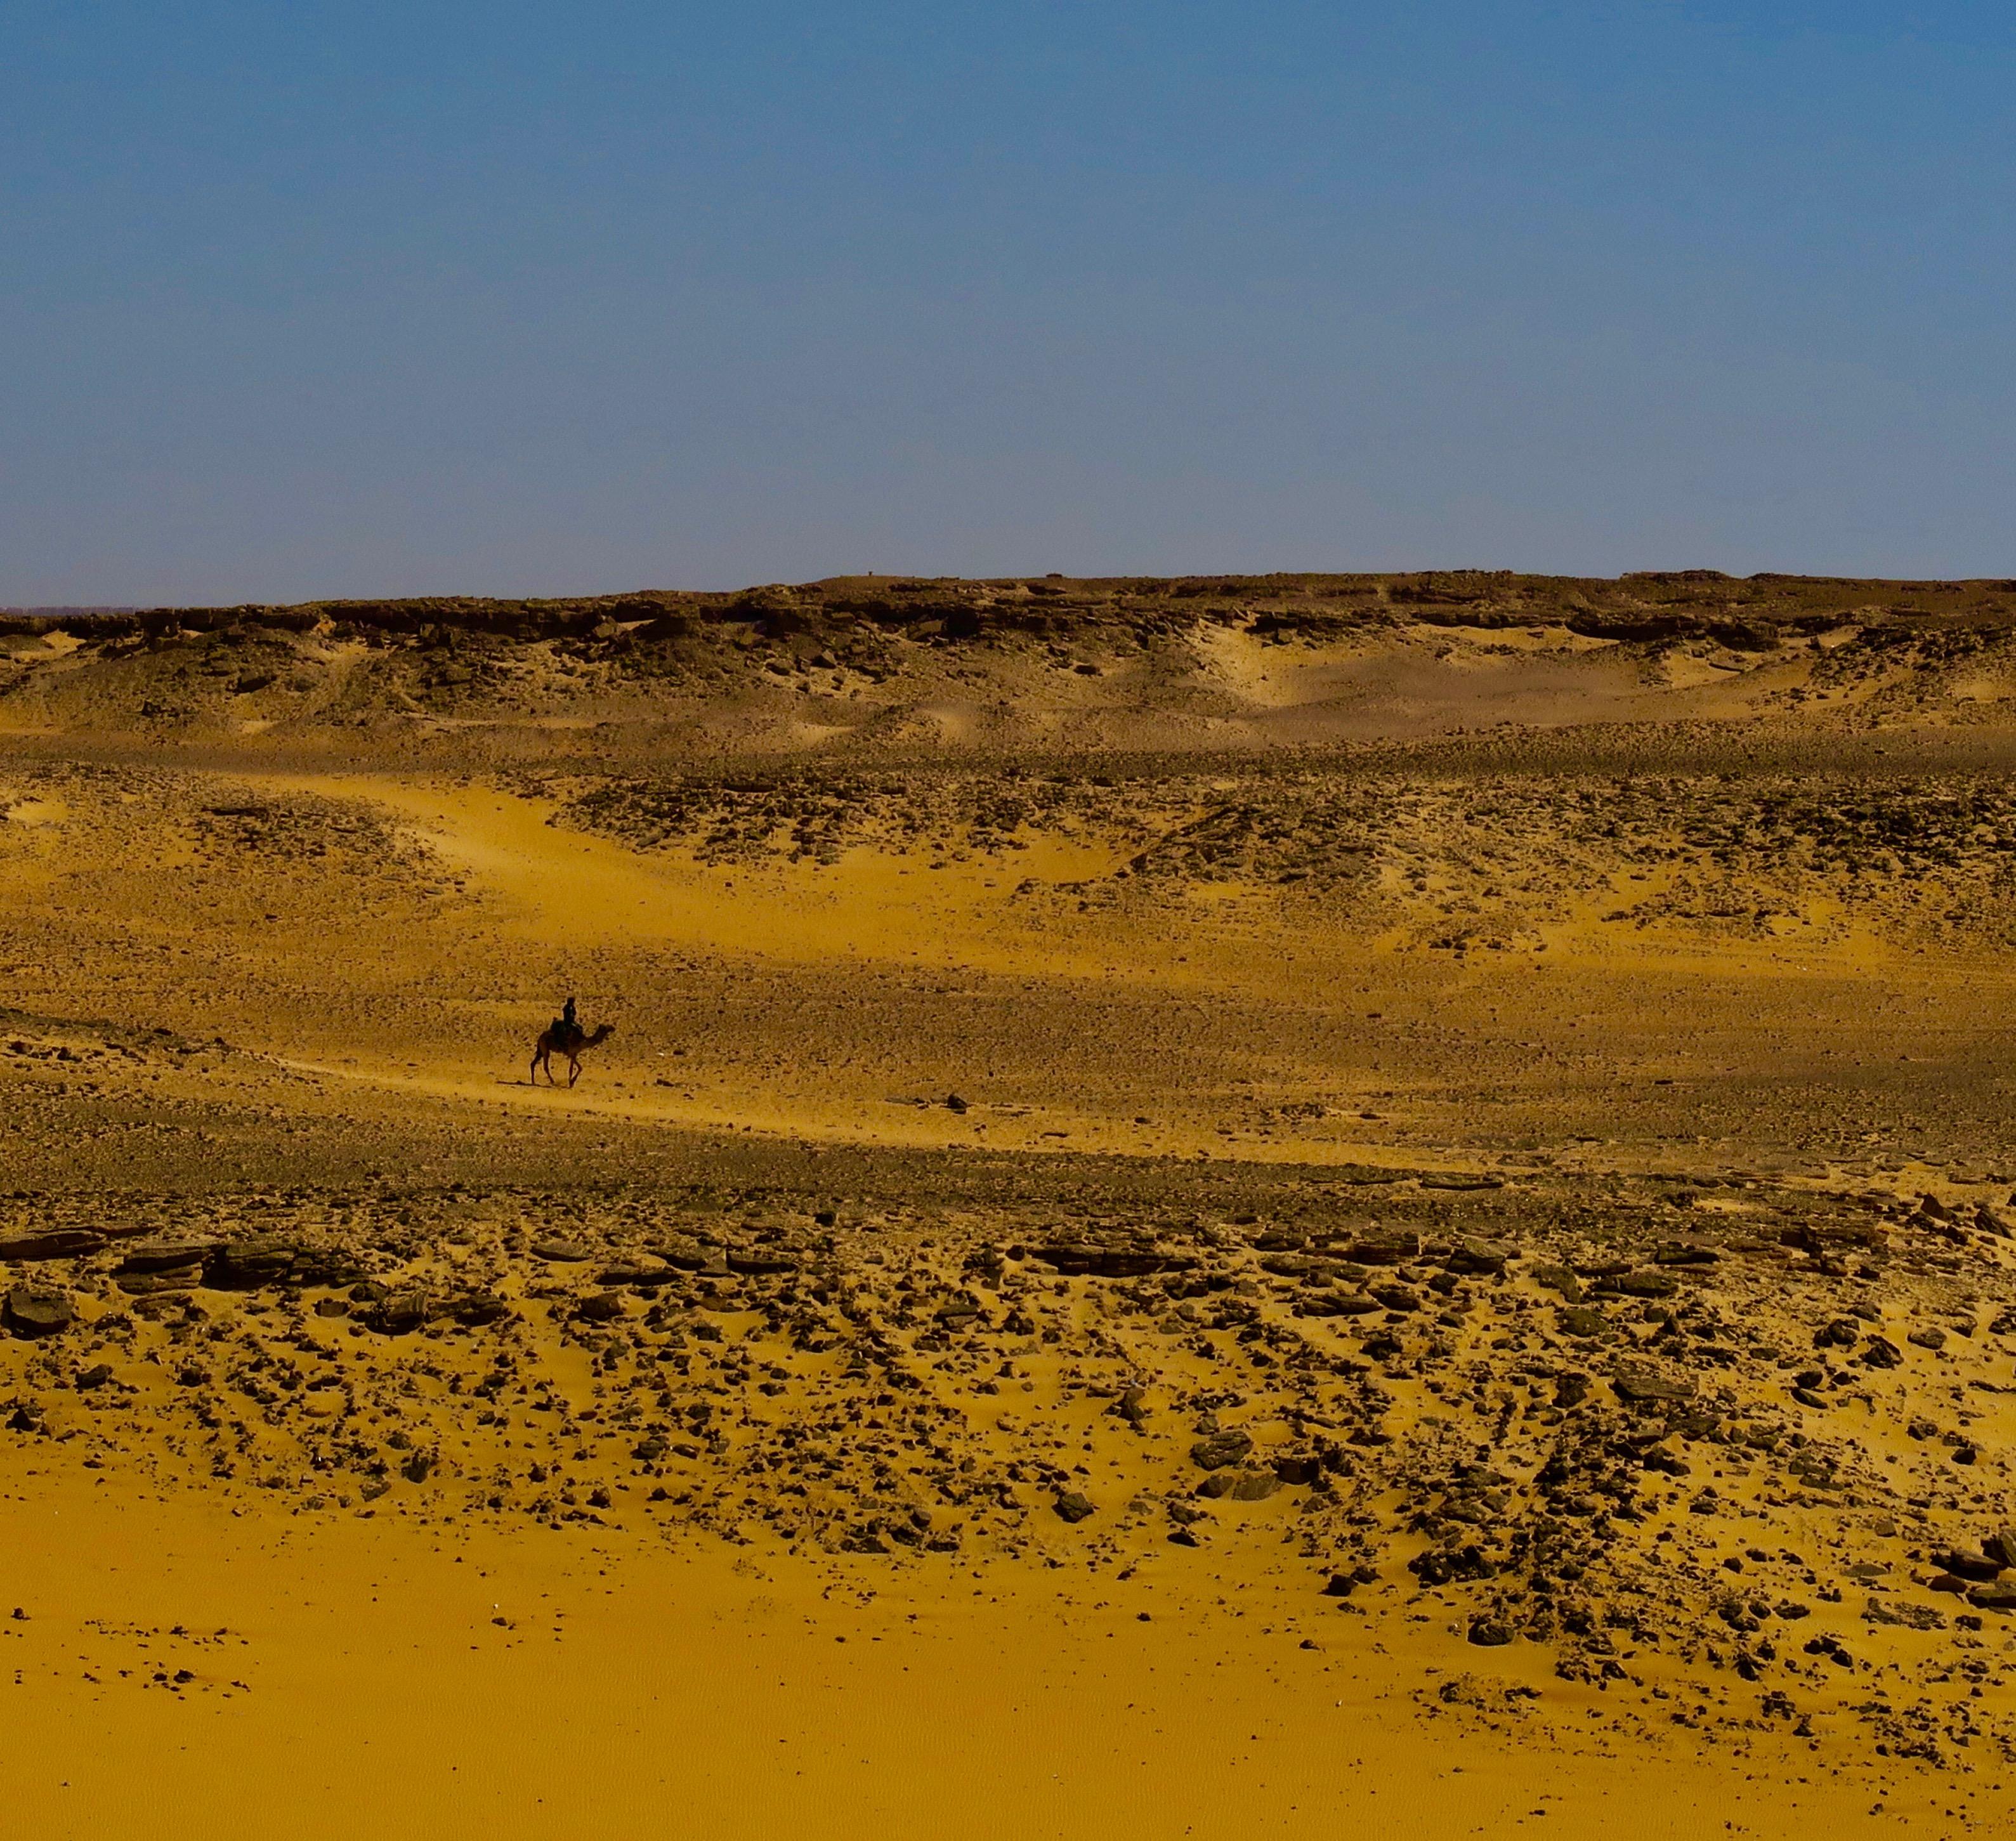 Lone Camel Rider